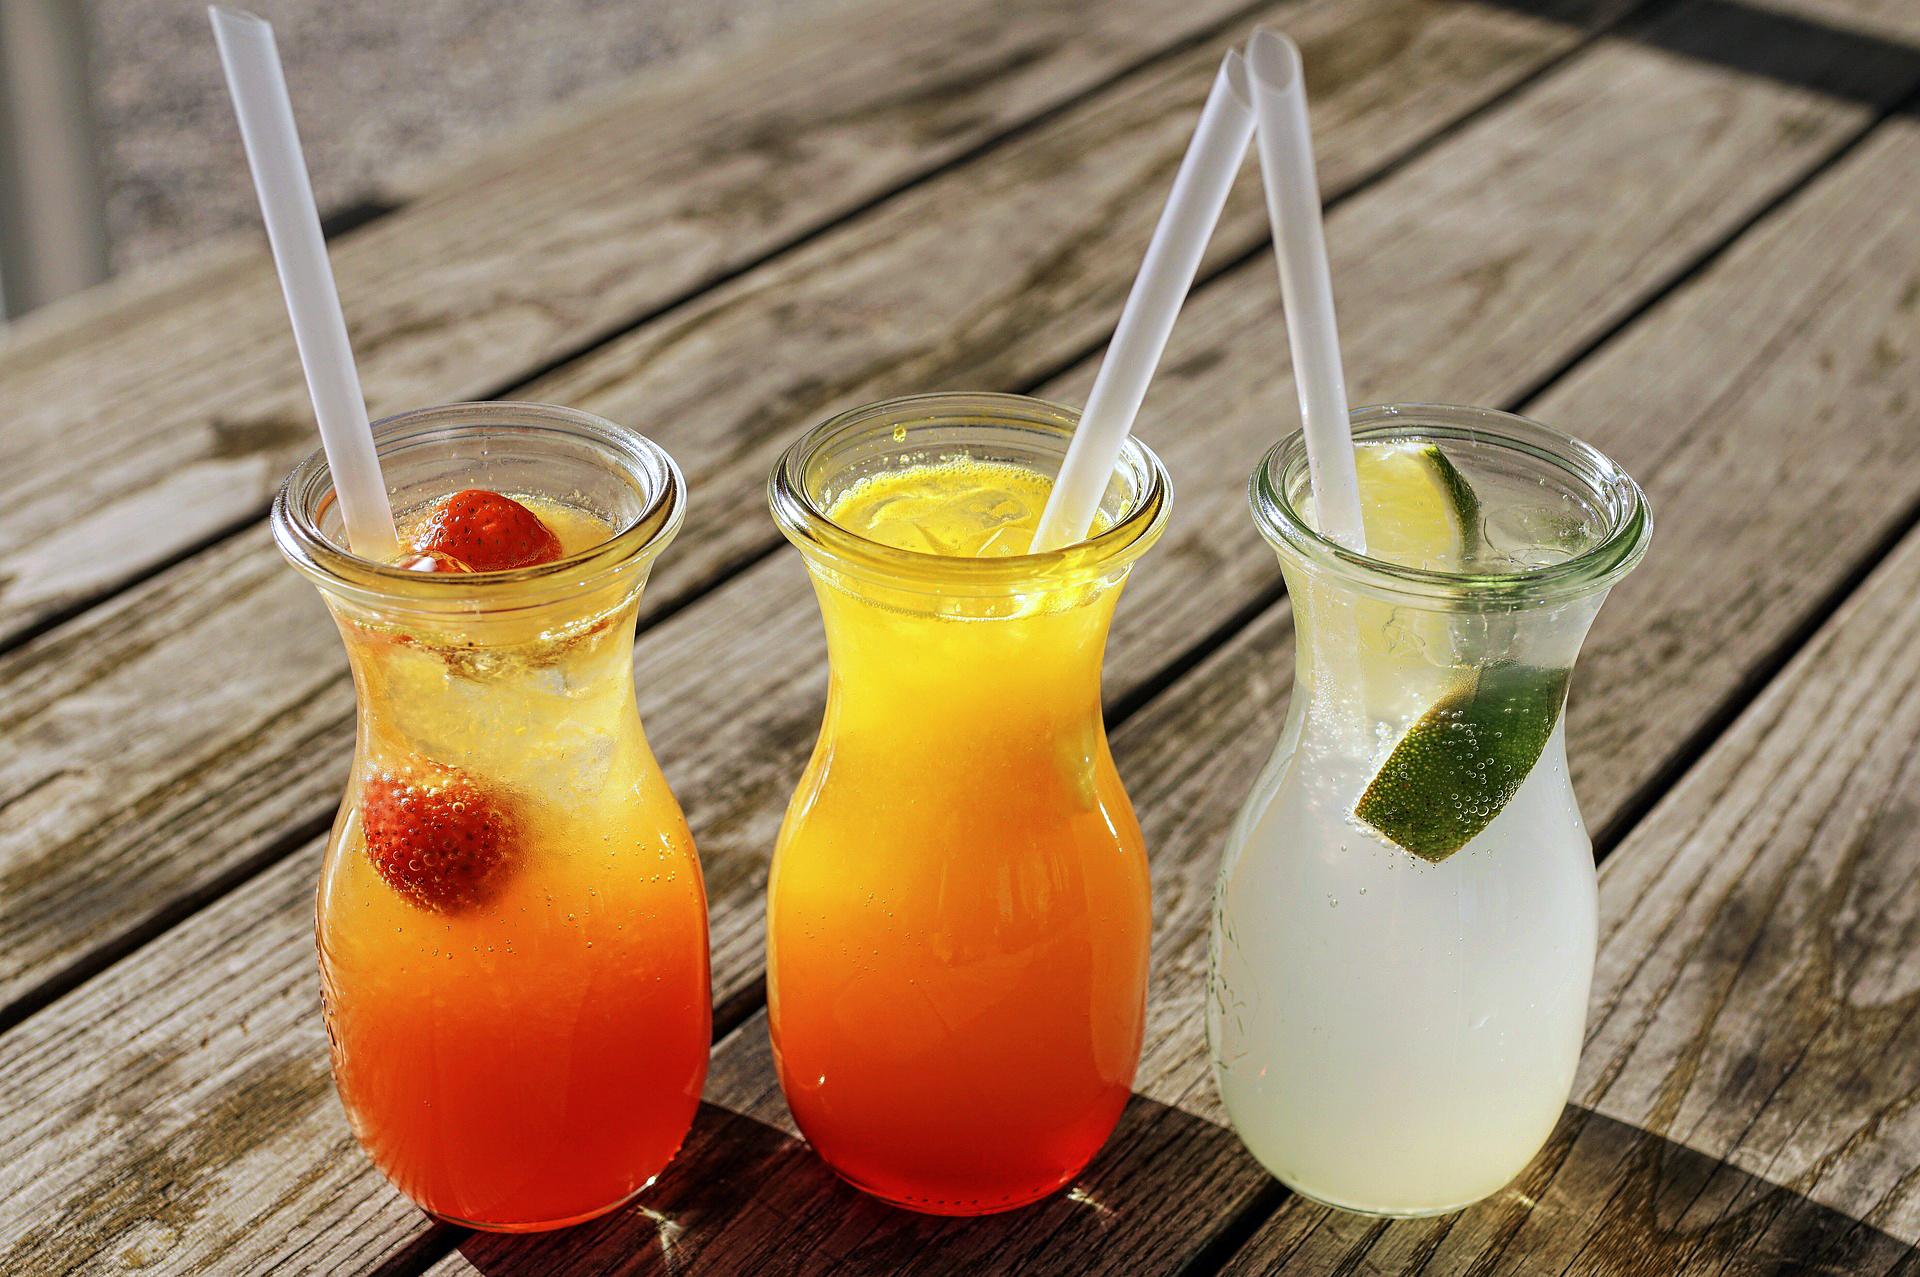 drink-3534434_1920